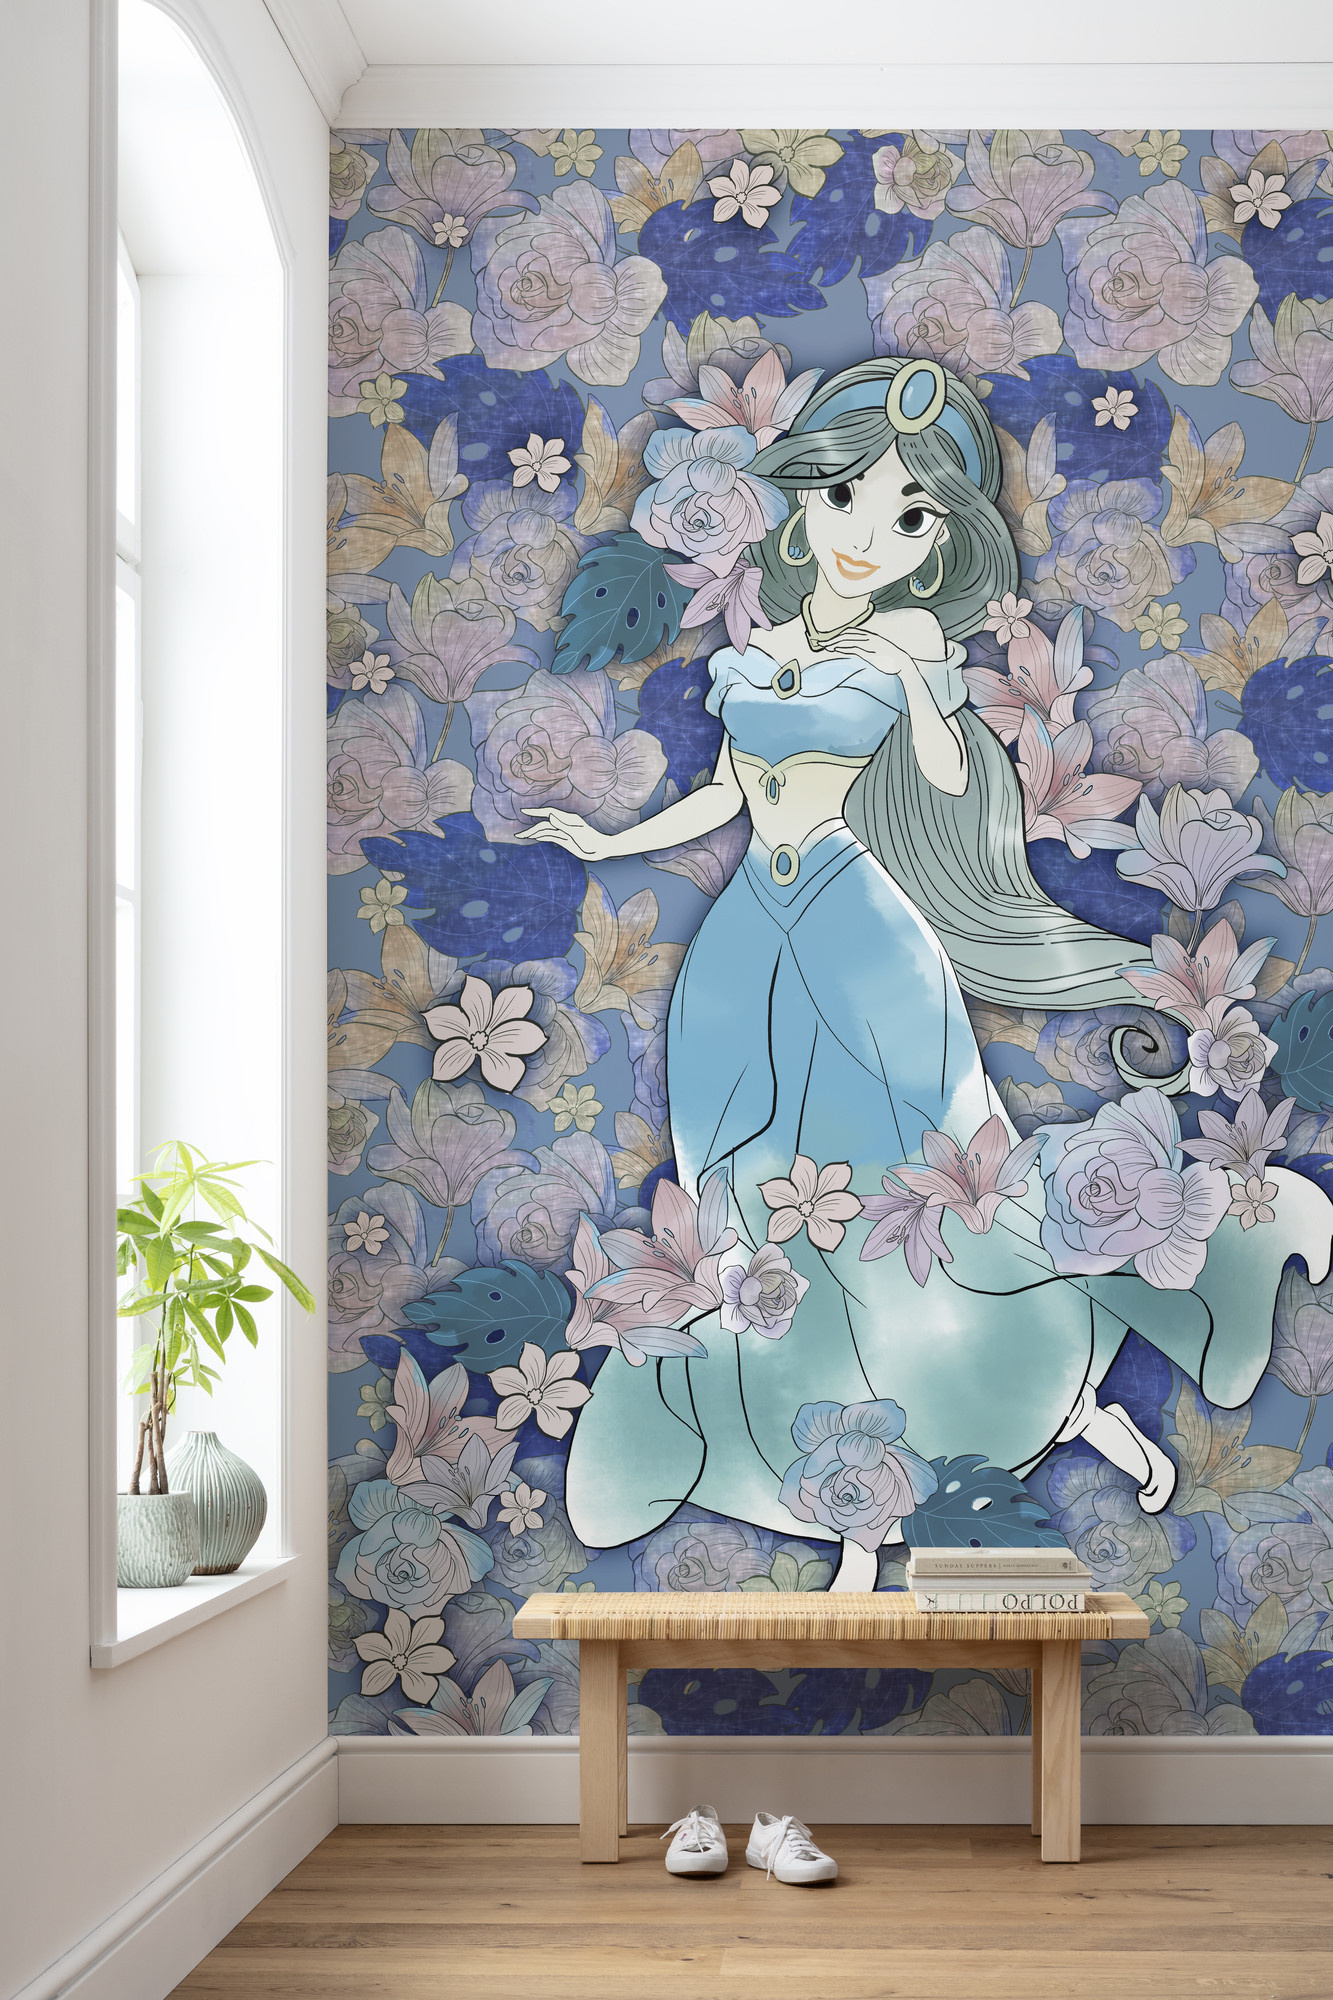 Disney Edition 4 Kinderbehang Komar - Kinderkamer behang Jasmin Colored Flowers